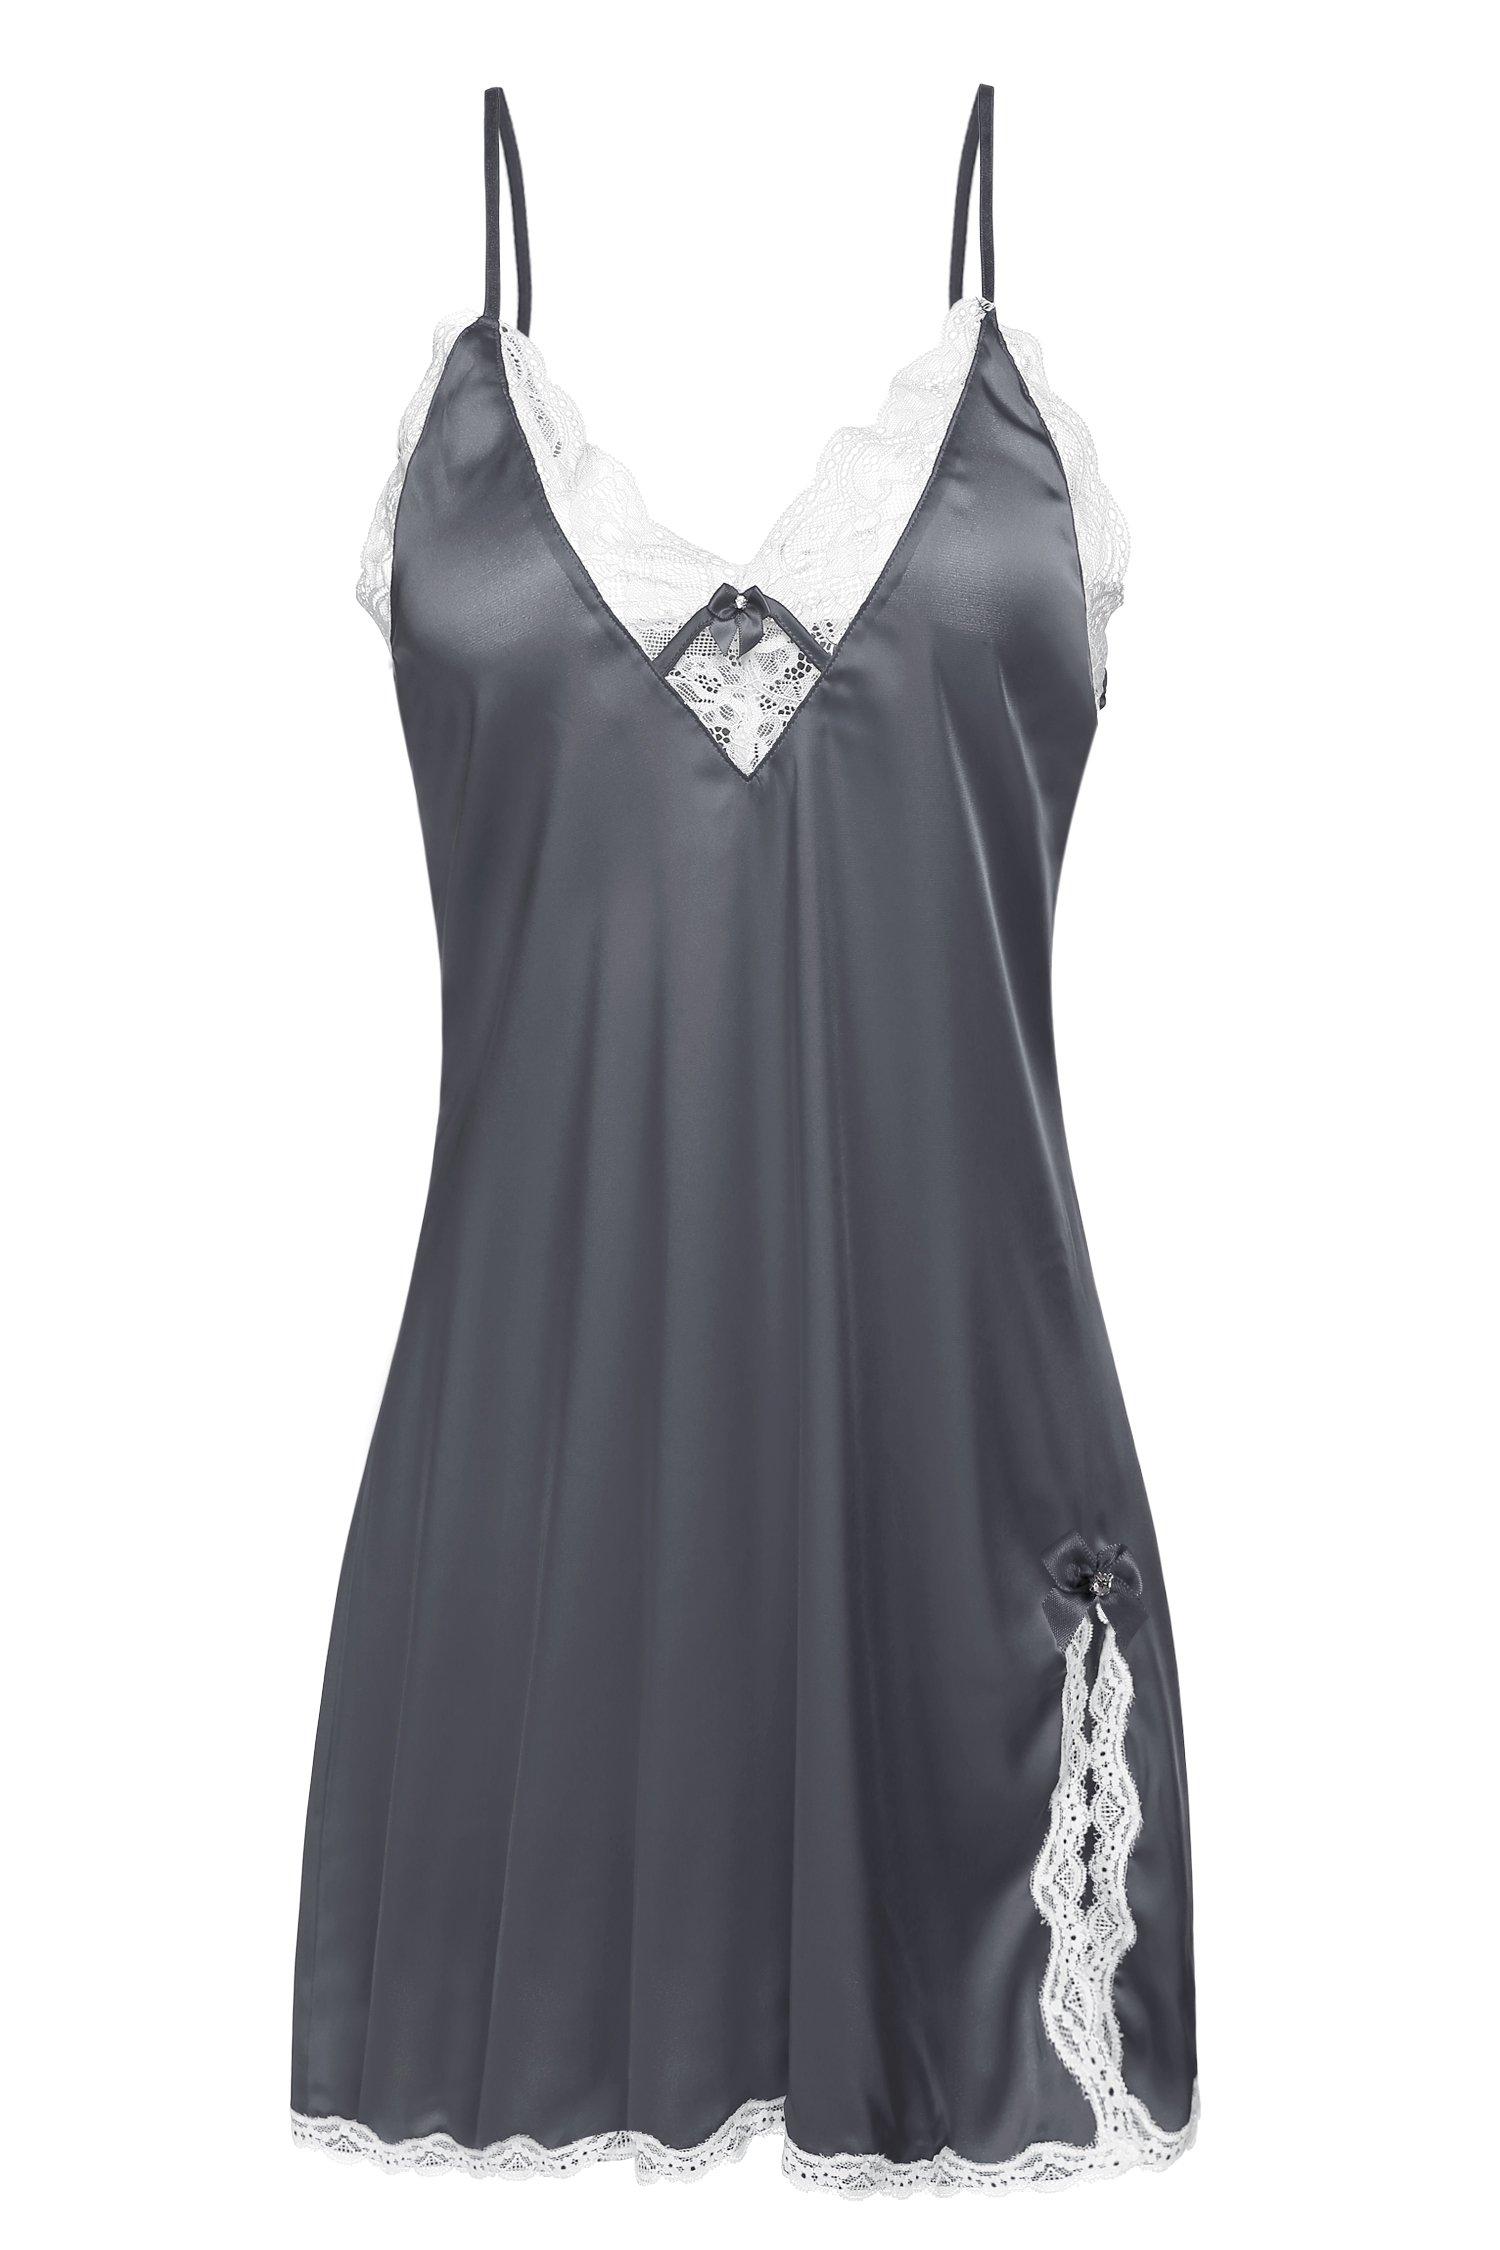 Ekouaer Women's Baby Doll Nightgown Lace Chemise Night Dress, Gray,XL